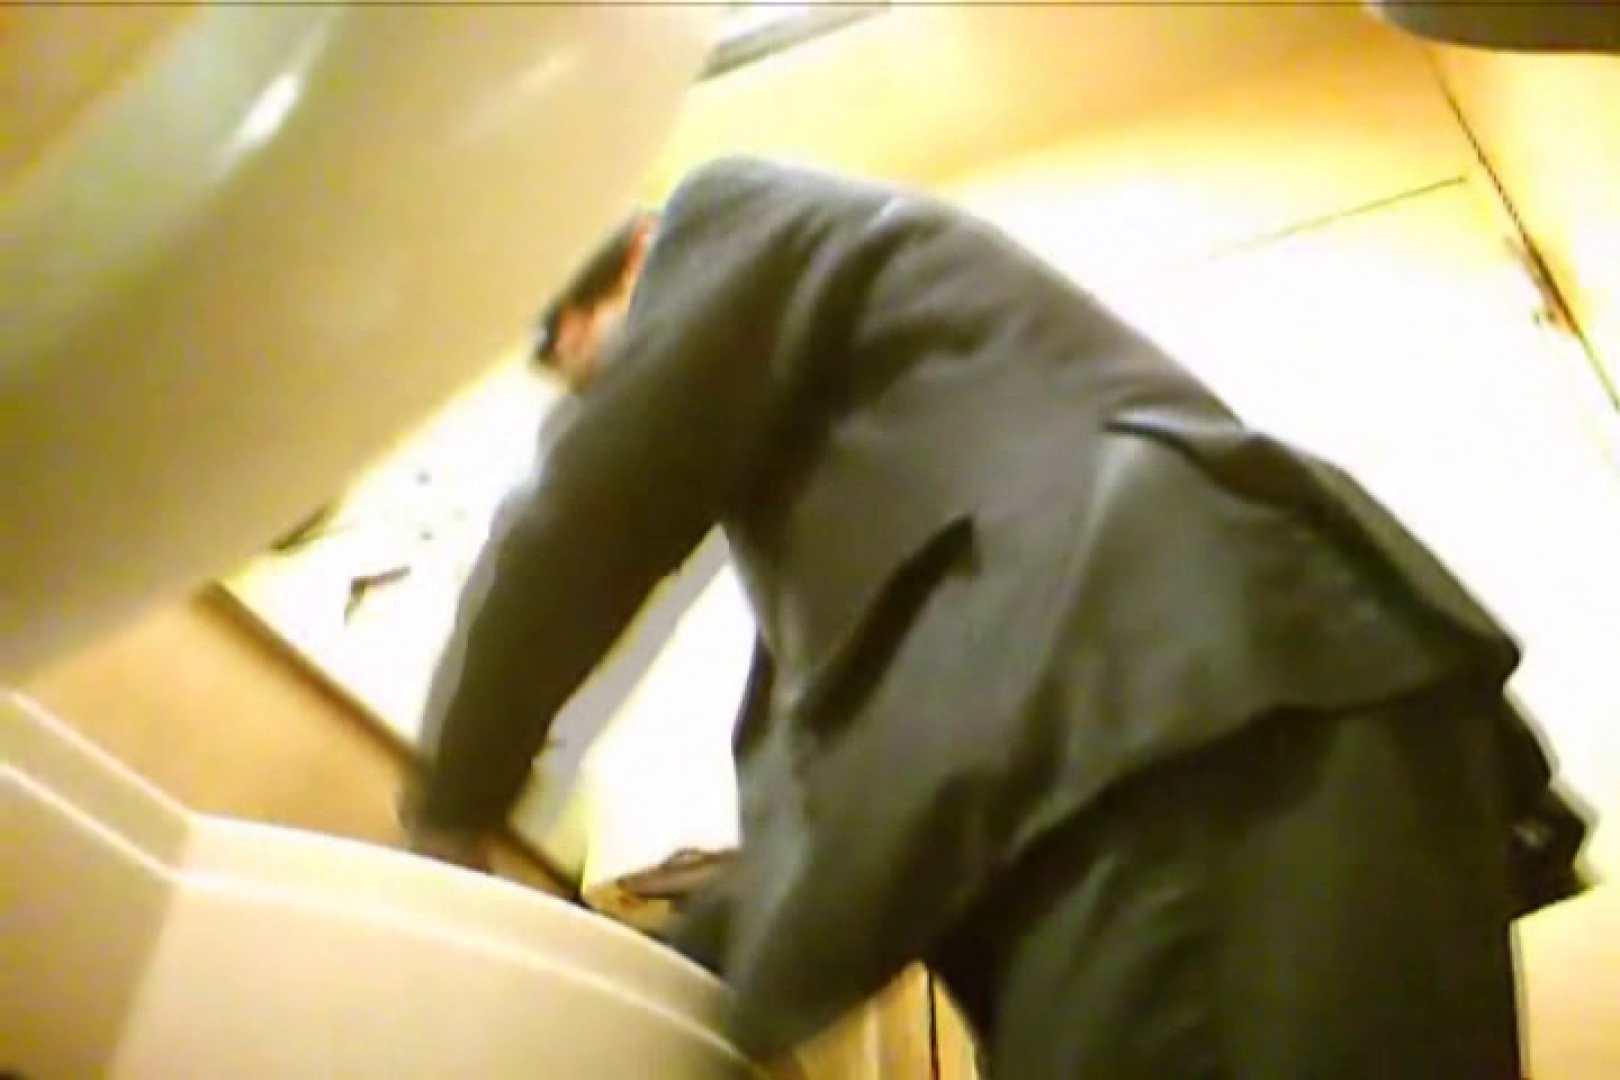 SEASON 2ND!掴み取りさんの洗面所覗き!in新幹線!VOL.01 人気シリーズ ゲイ無料エロ画像 104連発 25